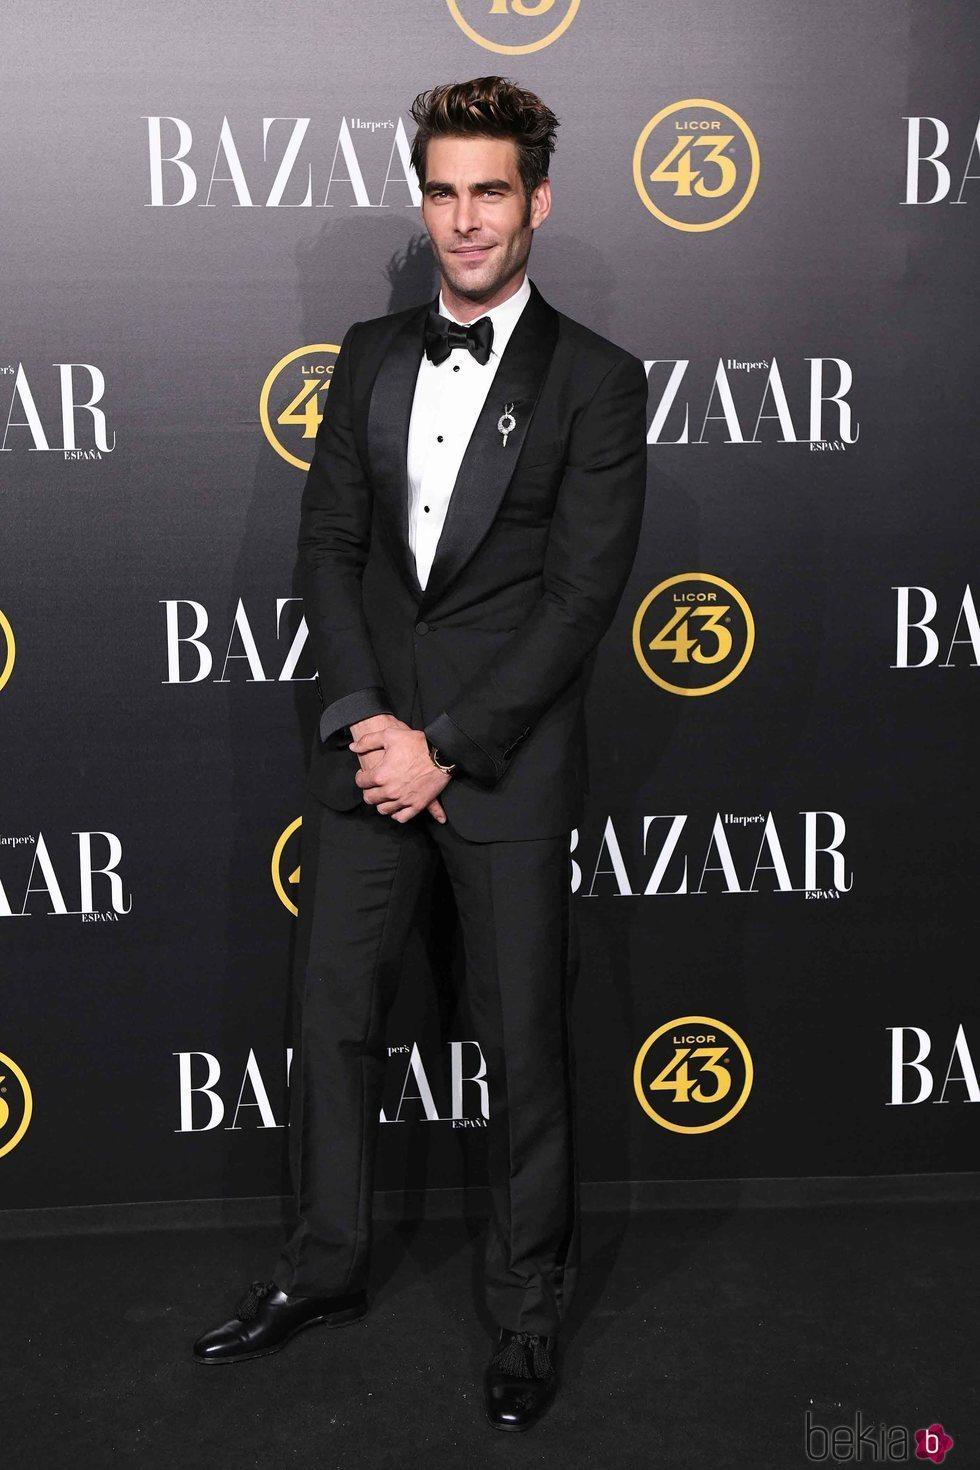 Jon Kortajarena en los premios Harper's Bazaar 2019